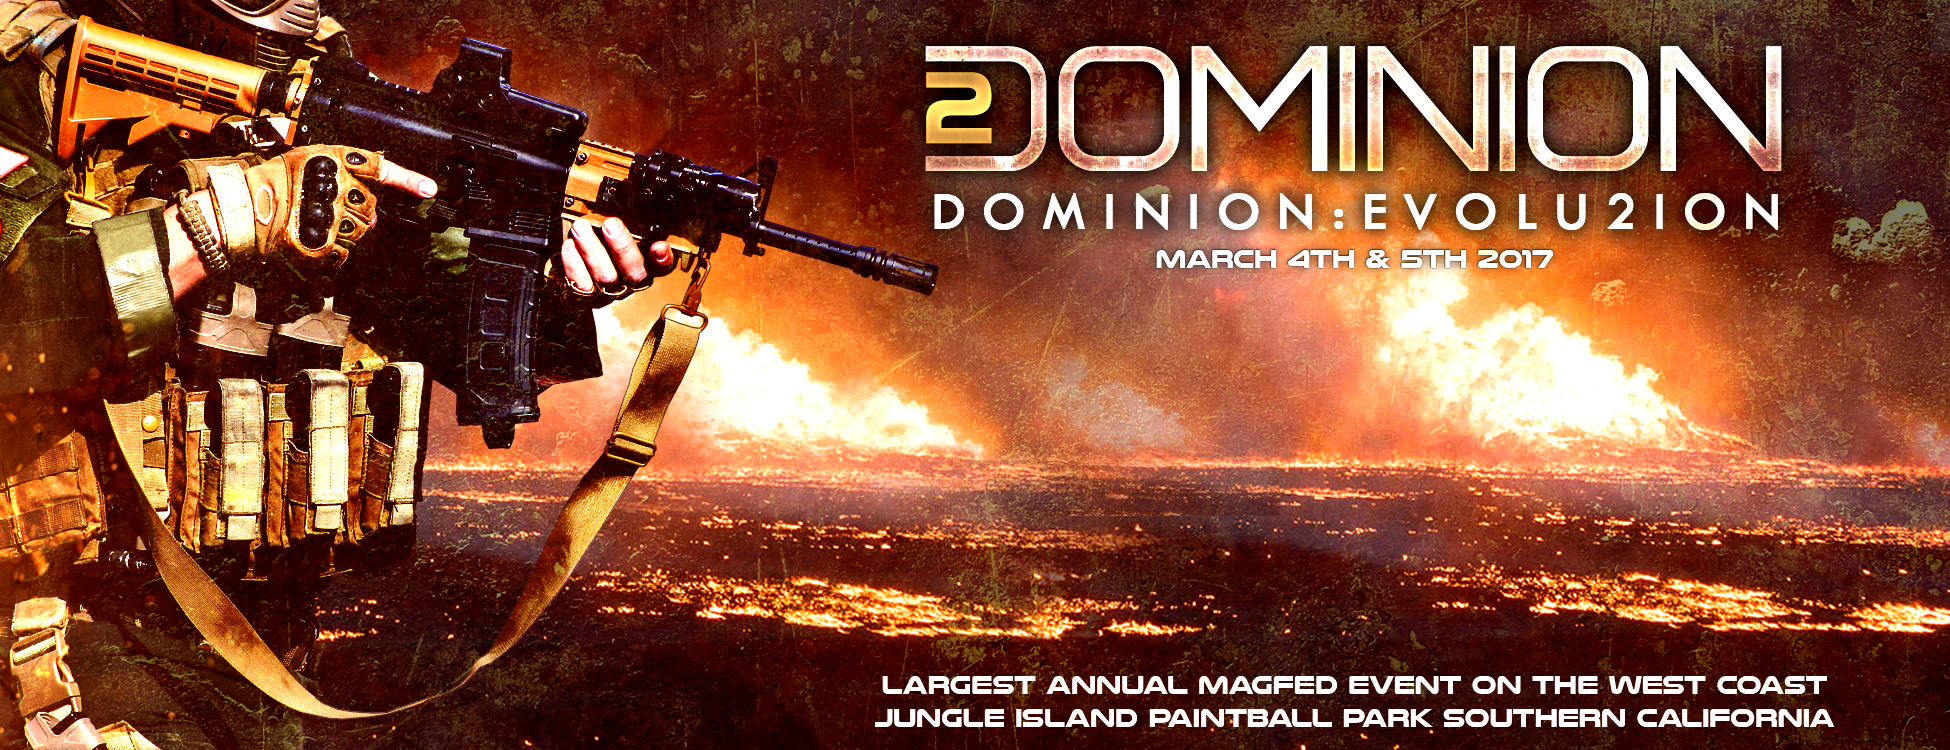 Dominion 3 banner 2017.jpg